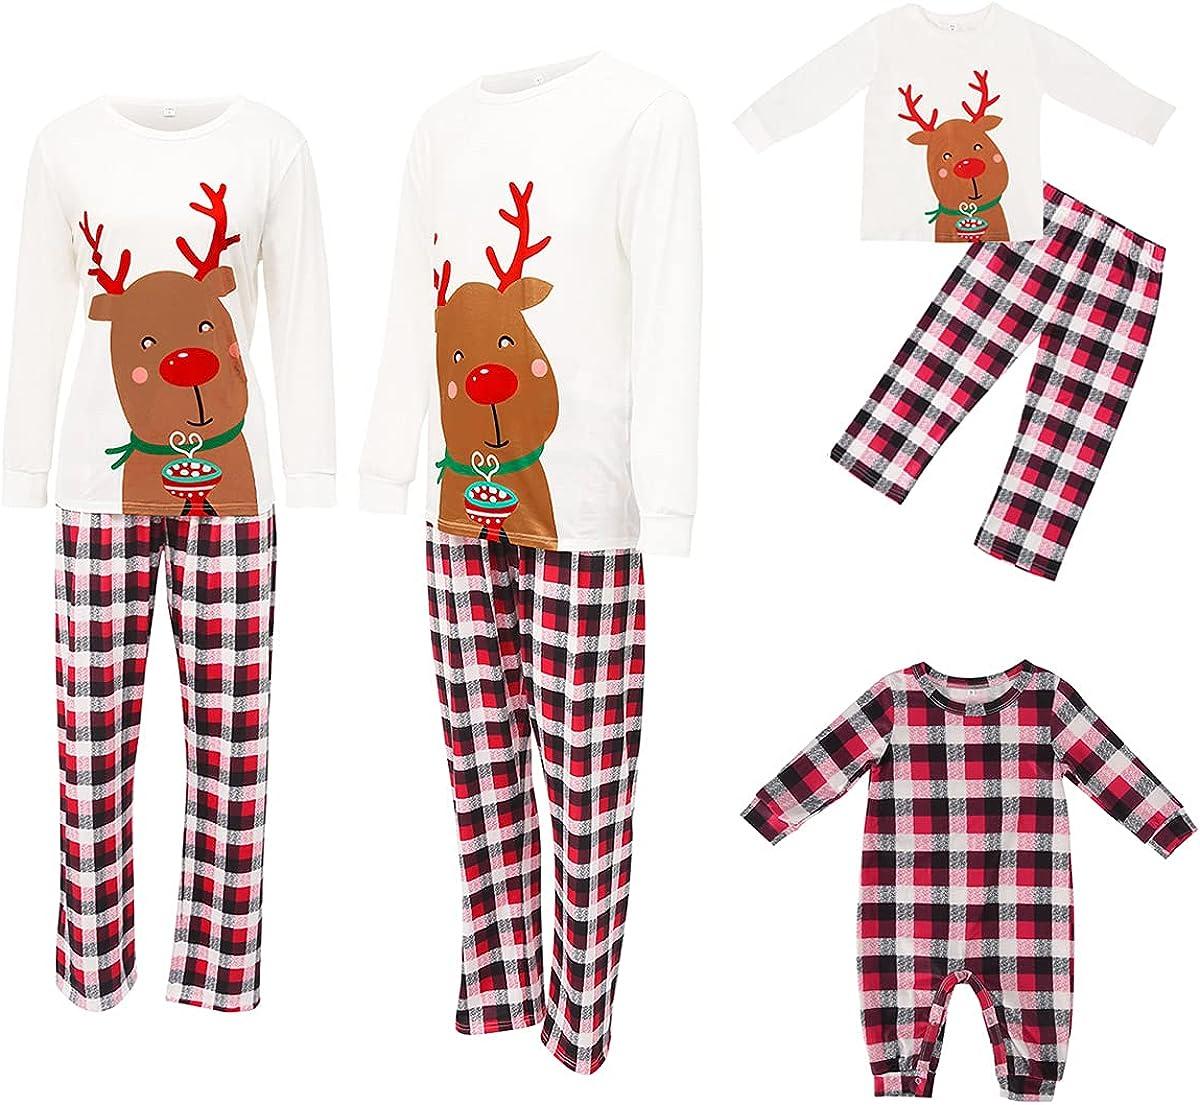 Family Christmas Pjs Deer Sleepshirt Plaid Pajama Bottoms Matching Set Jammies for Adult Kid Holiday Xmas Sleepwear